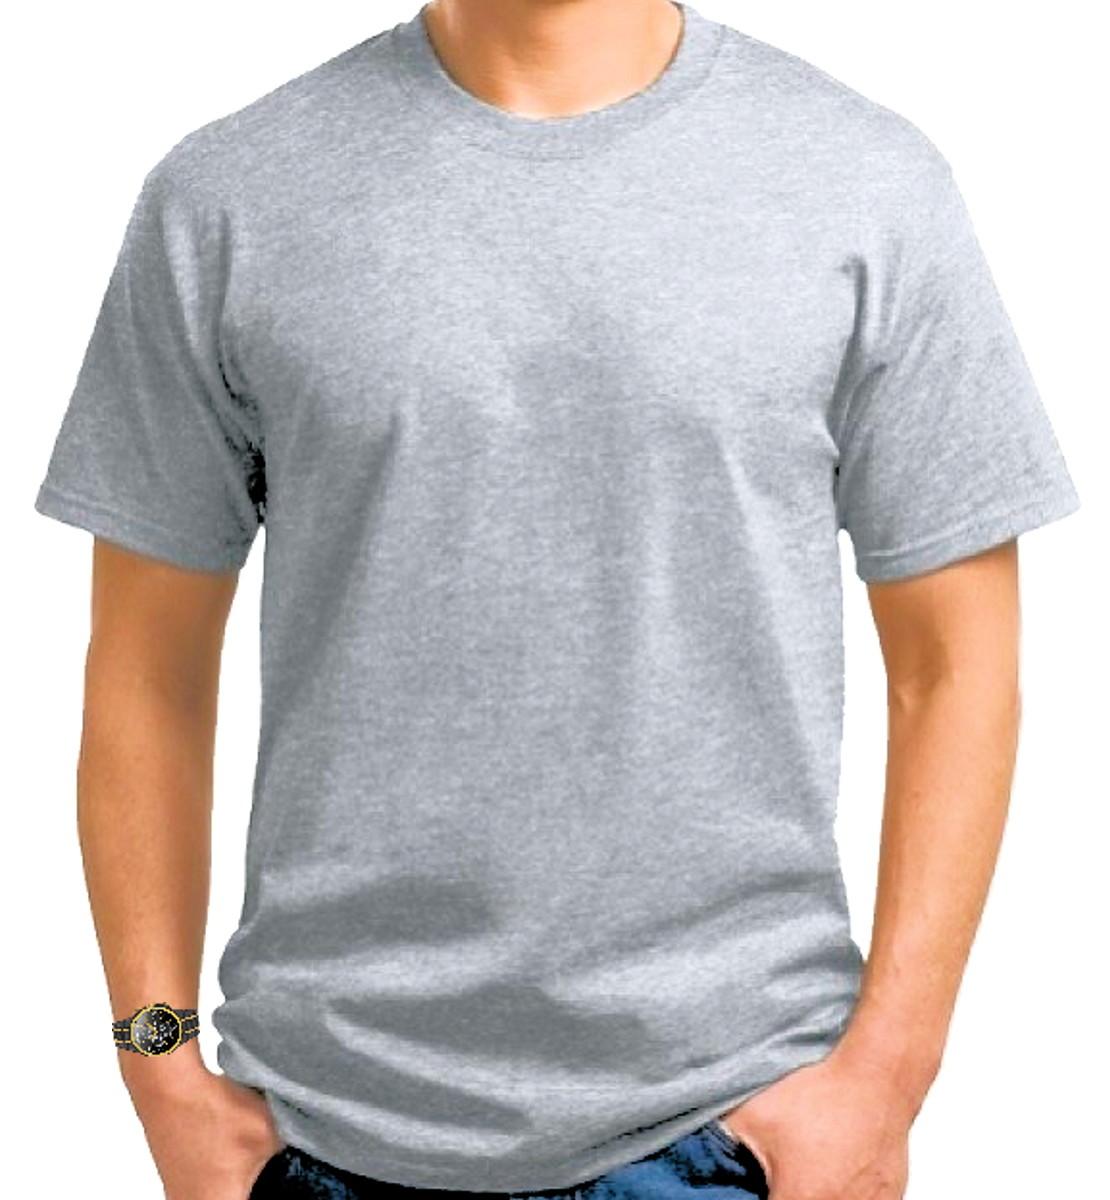 f36cb5afd8 50 Camisetas 100% poliéster Mescla no Elo7